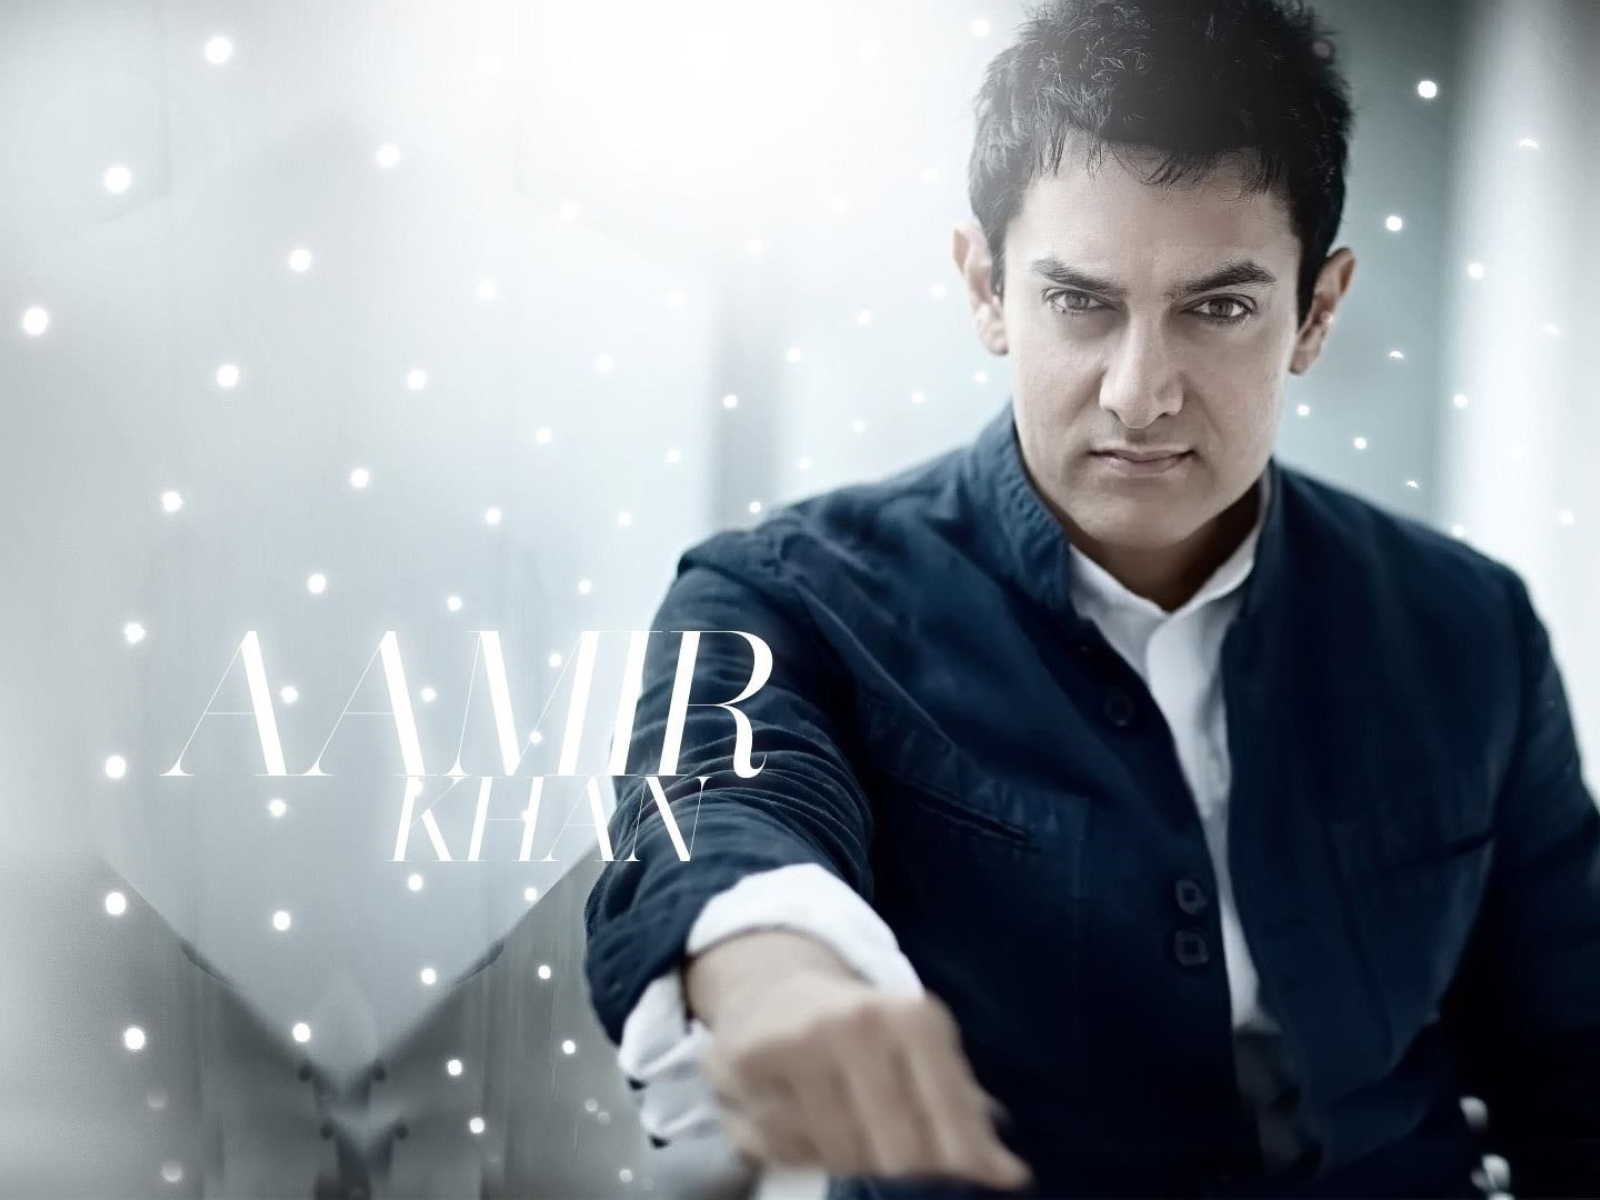 Download Aamir Khan Latest Photoshoot 7680x4320 Resolution